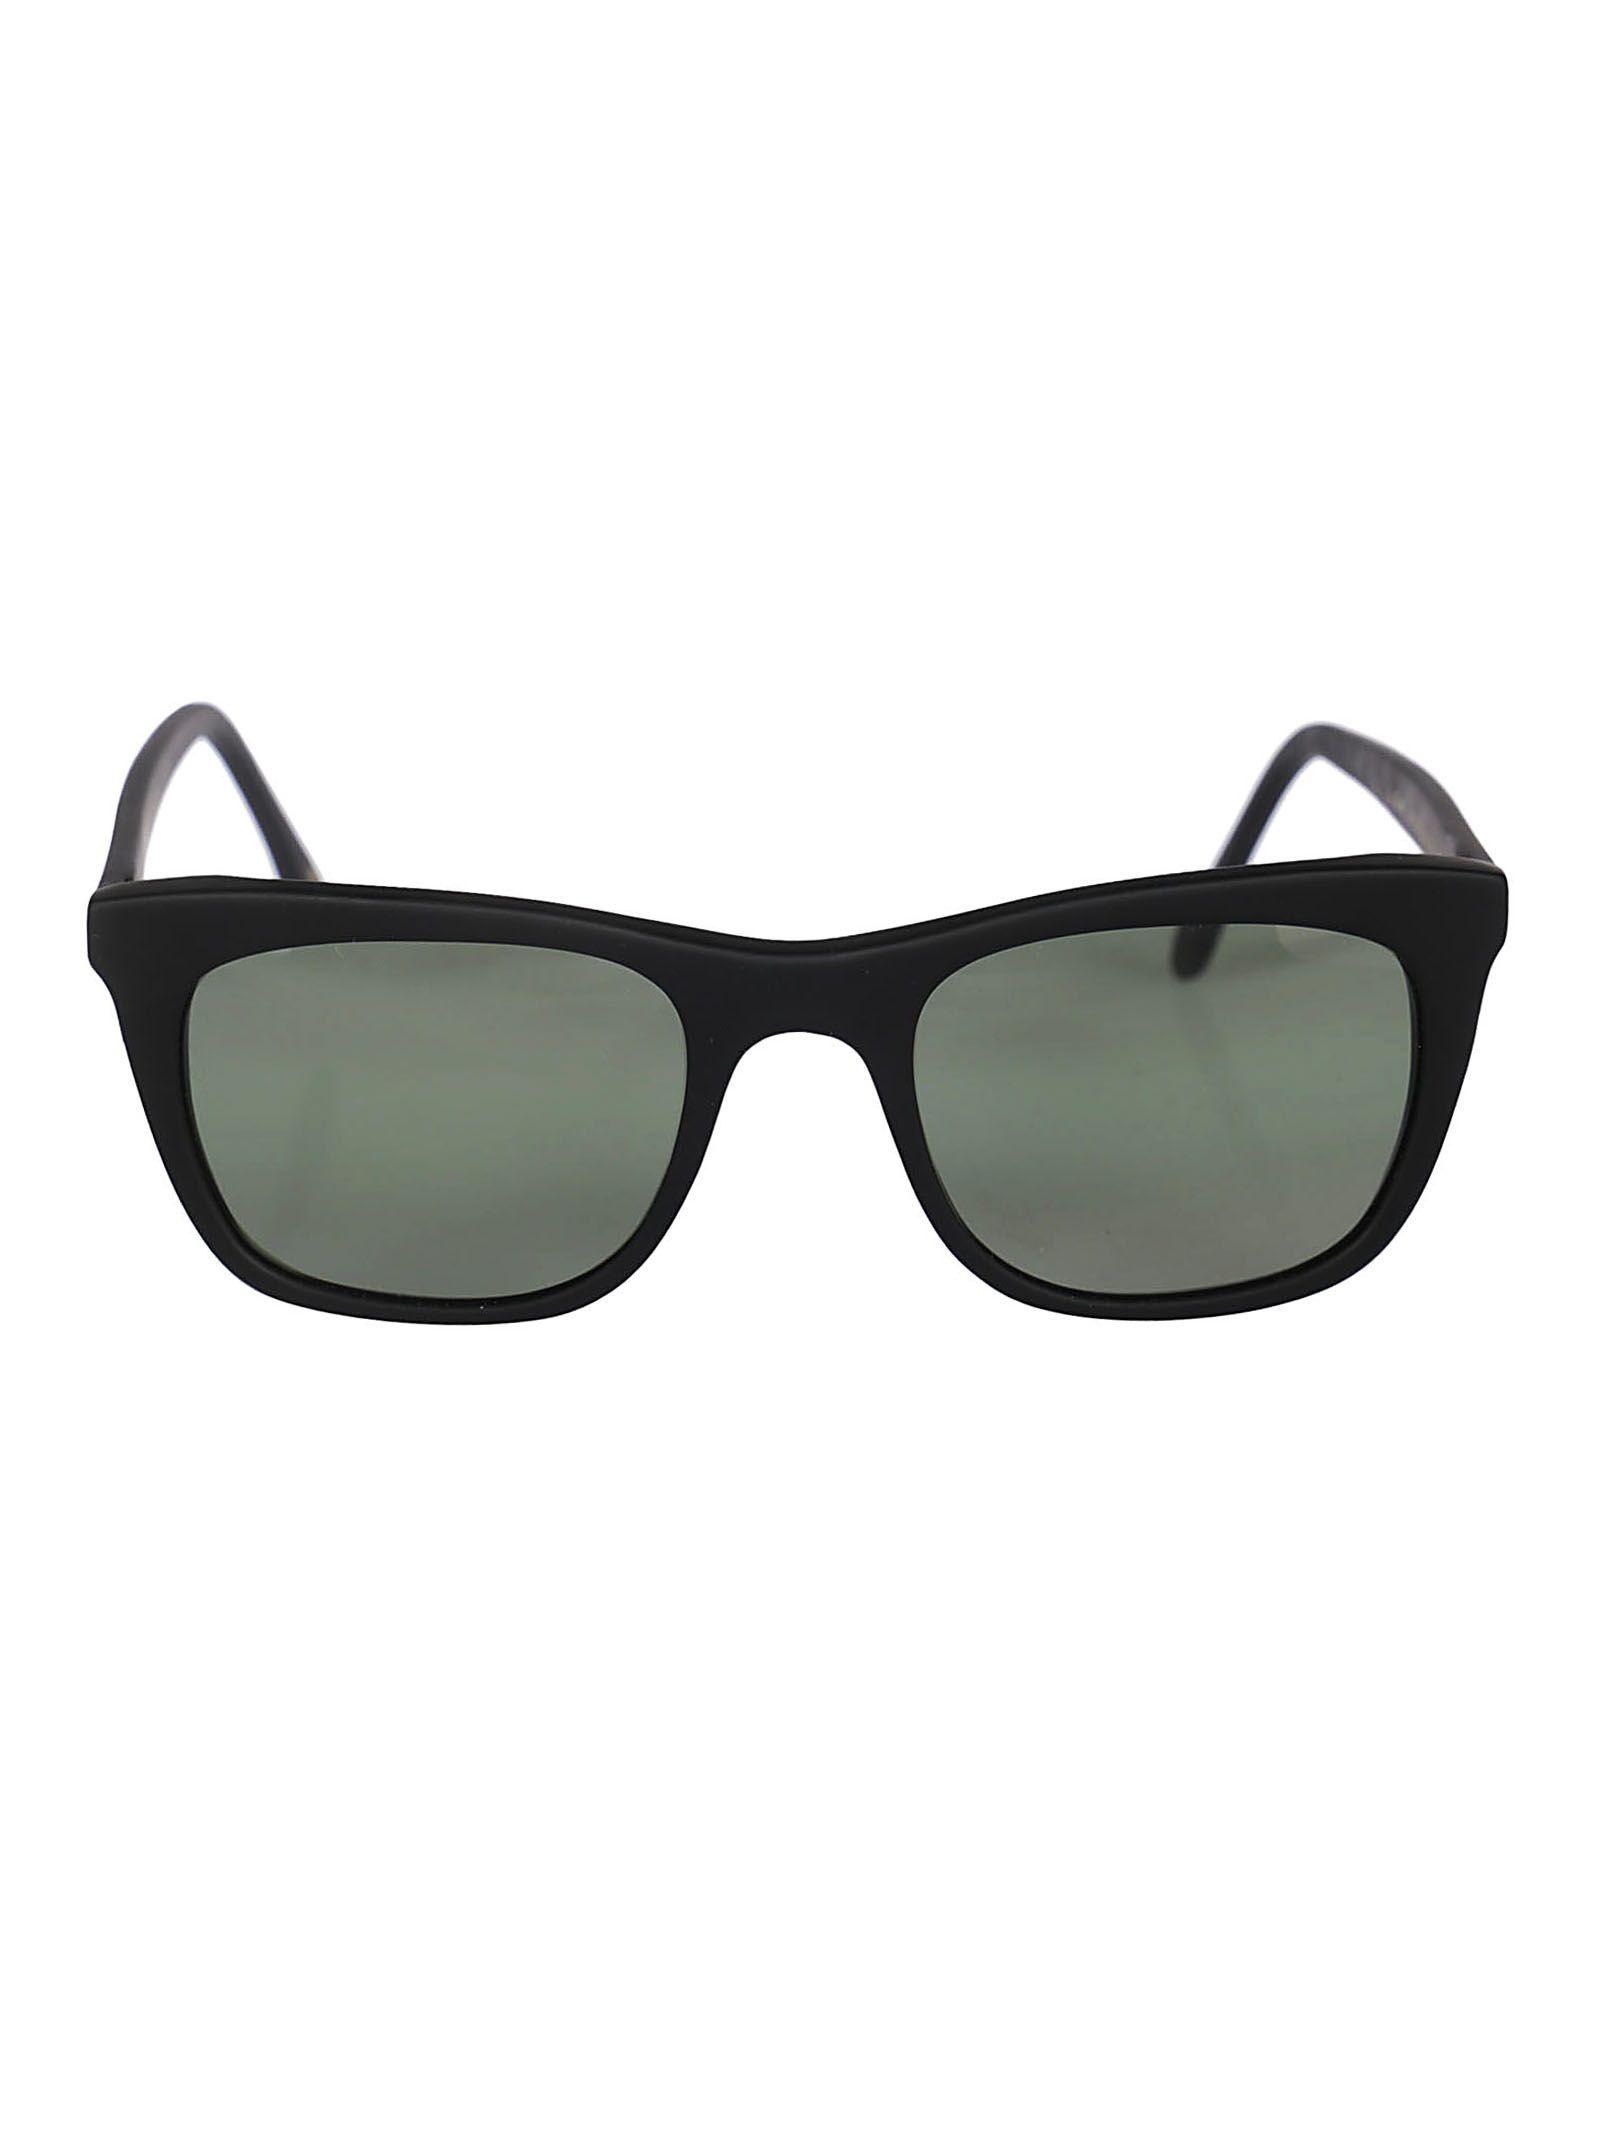 L.G.R Lgr Skipper Yacht Club Sunglasses in 22Yc Black Matte